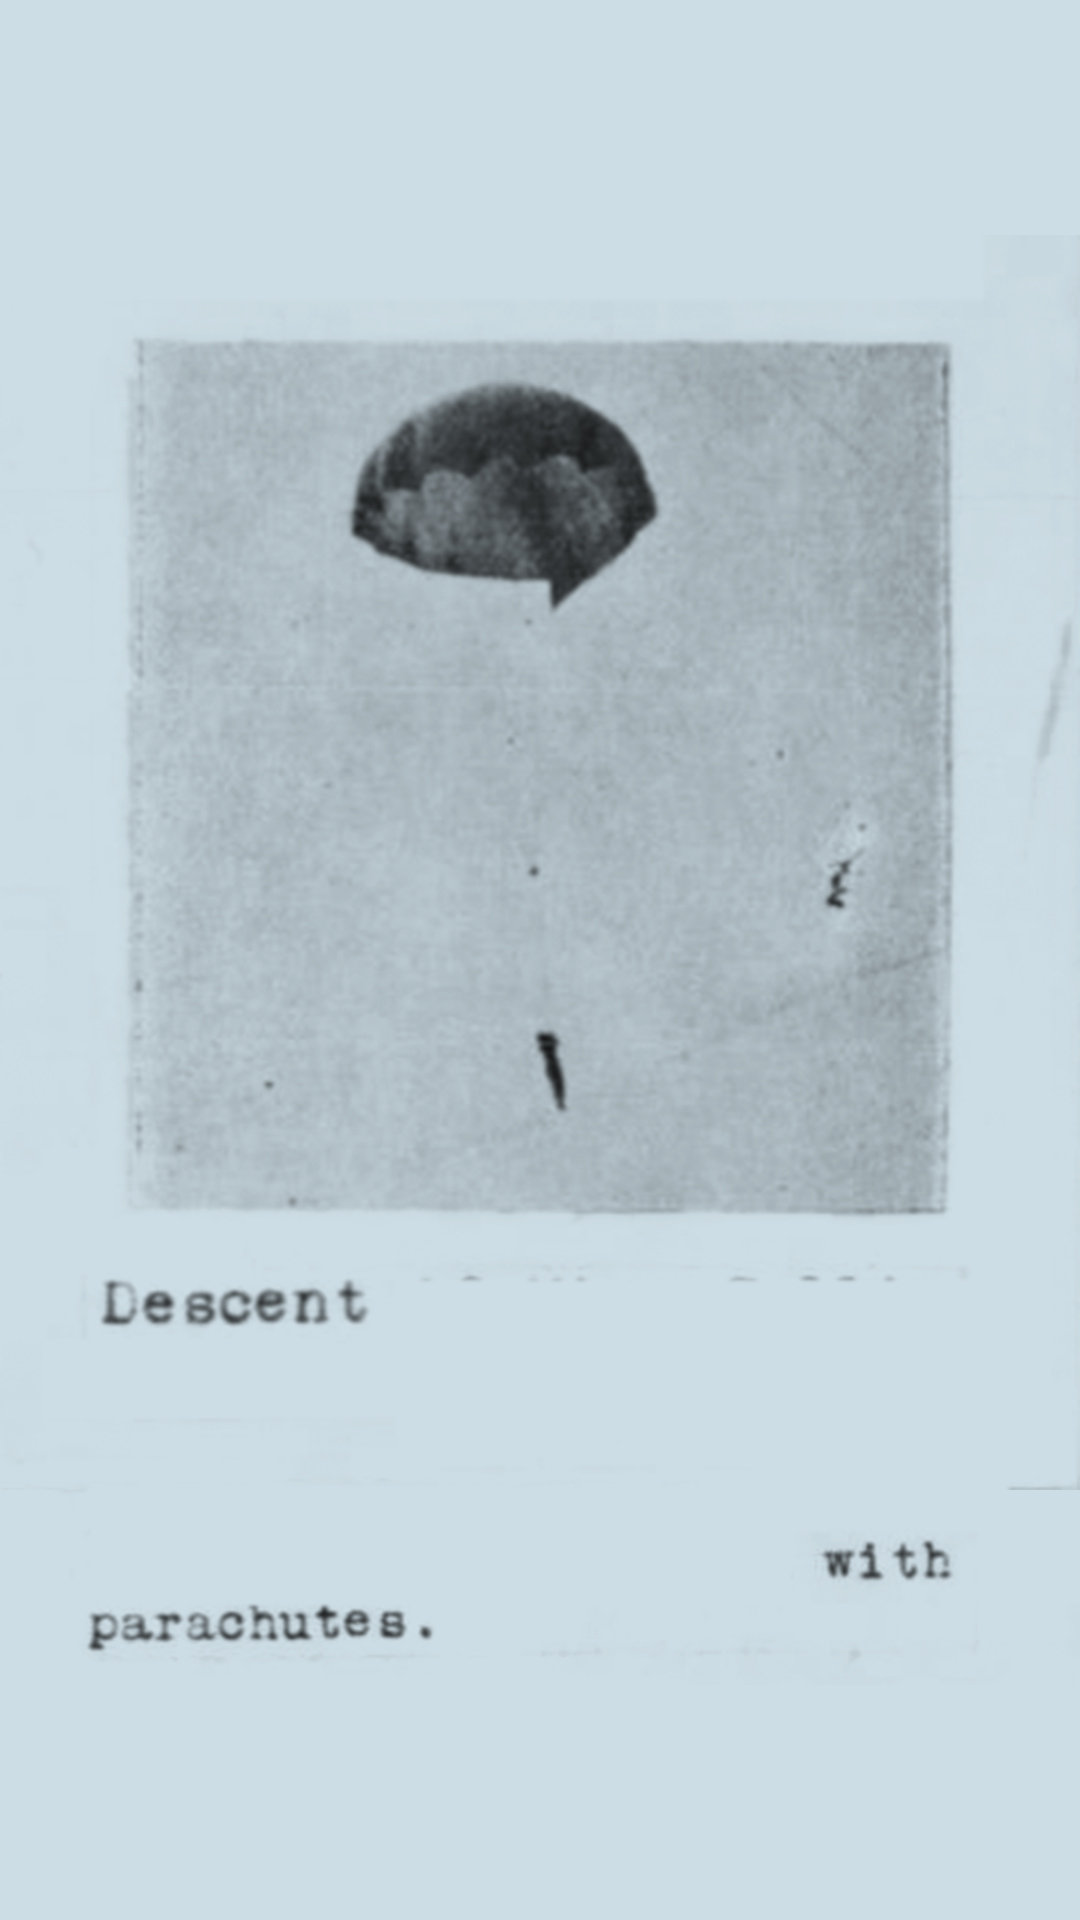 descentparachute.jpg